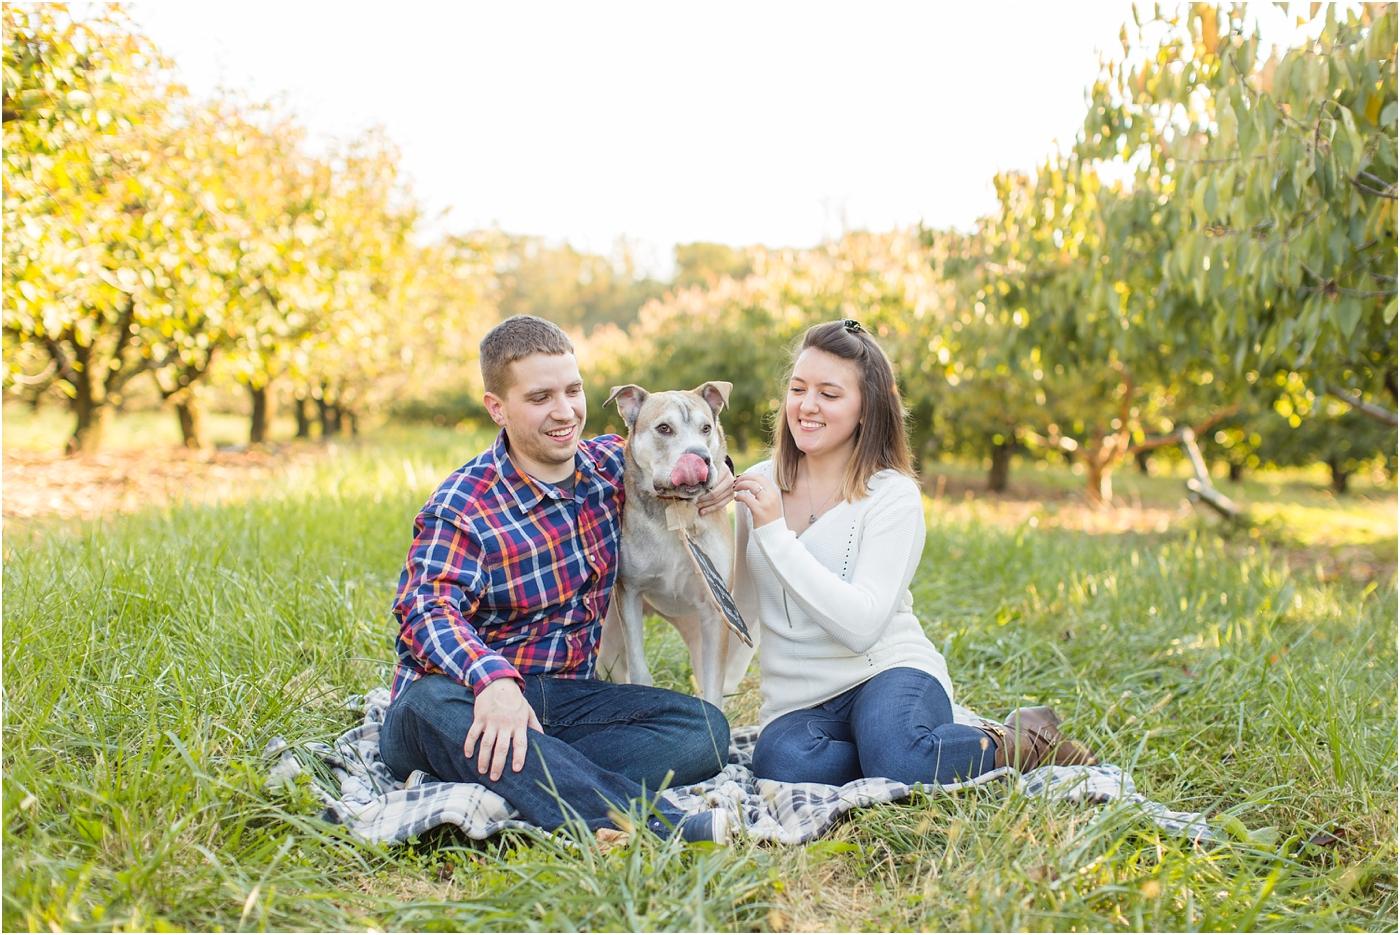 Larriland-Farm-Engagement-Photo_0008.jpg